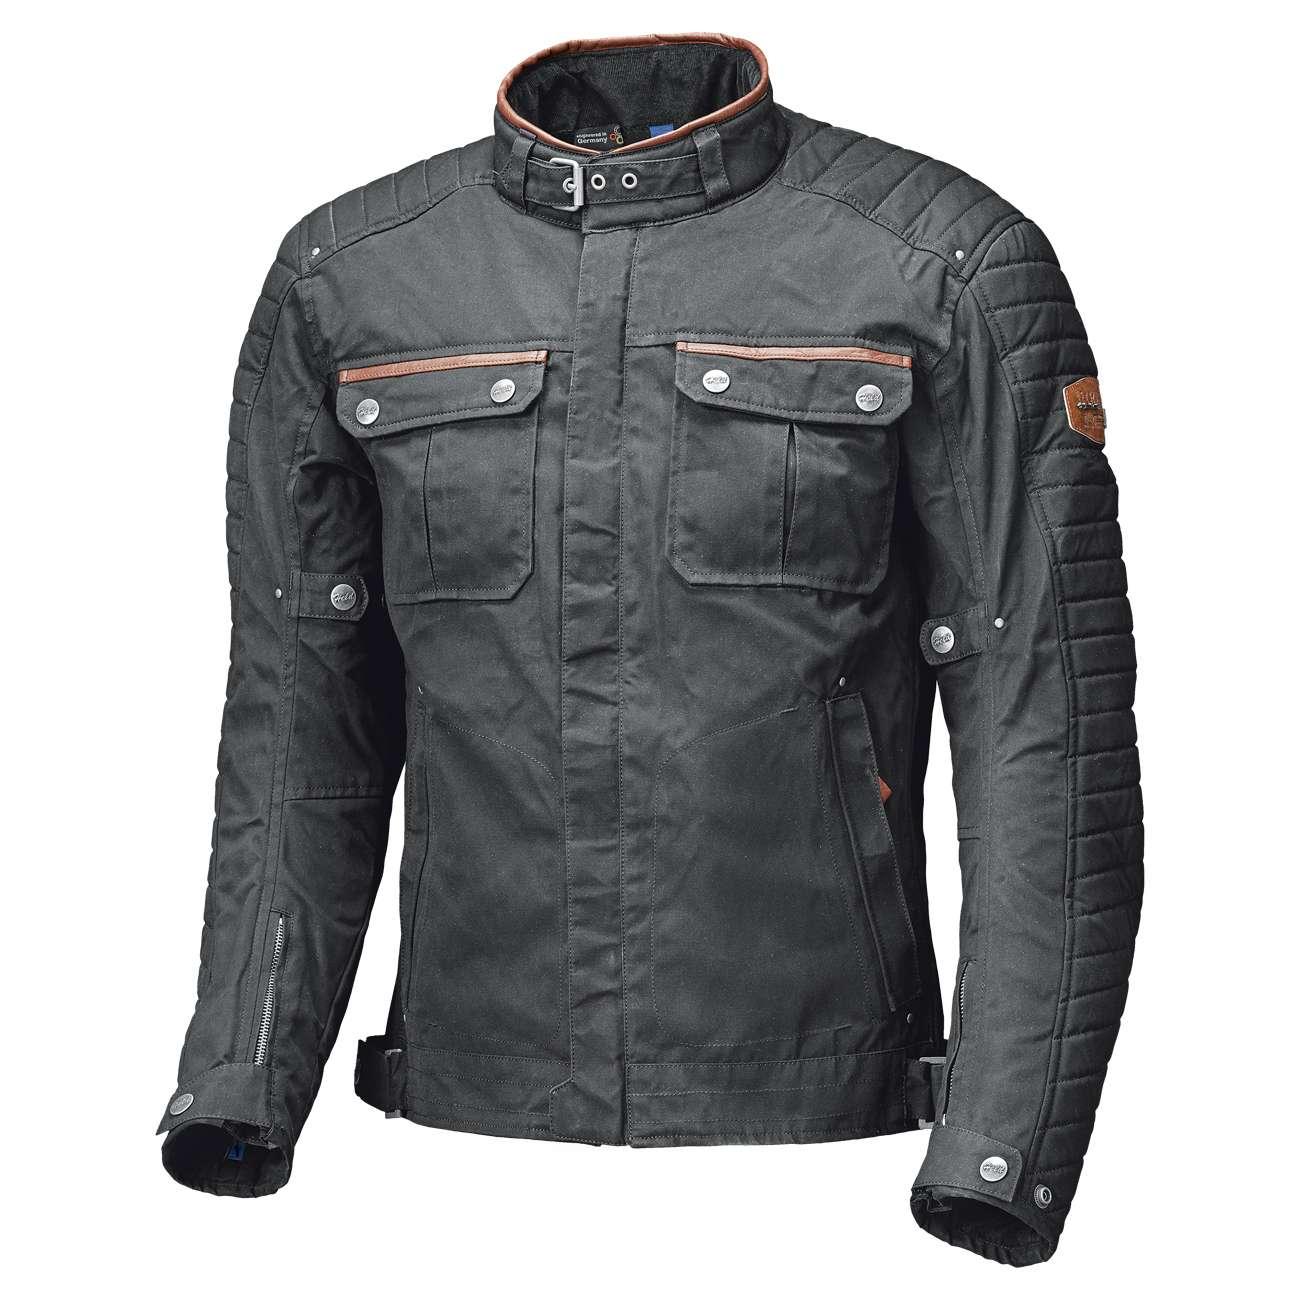 Held Urban Jacke Bodie Motorradjacke khaki NEU